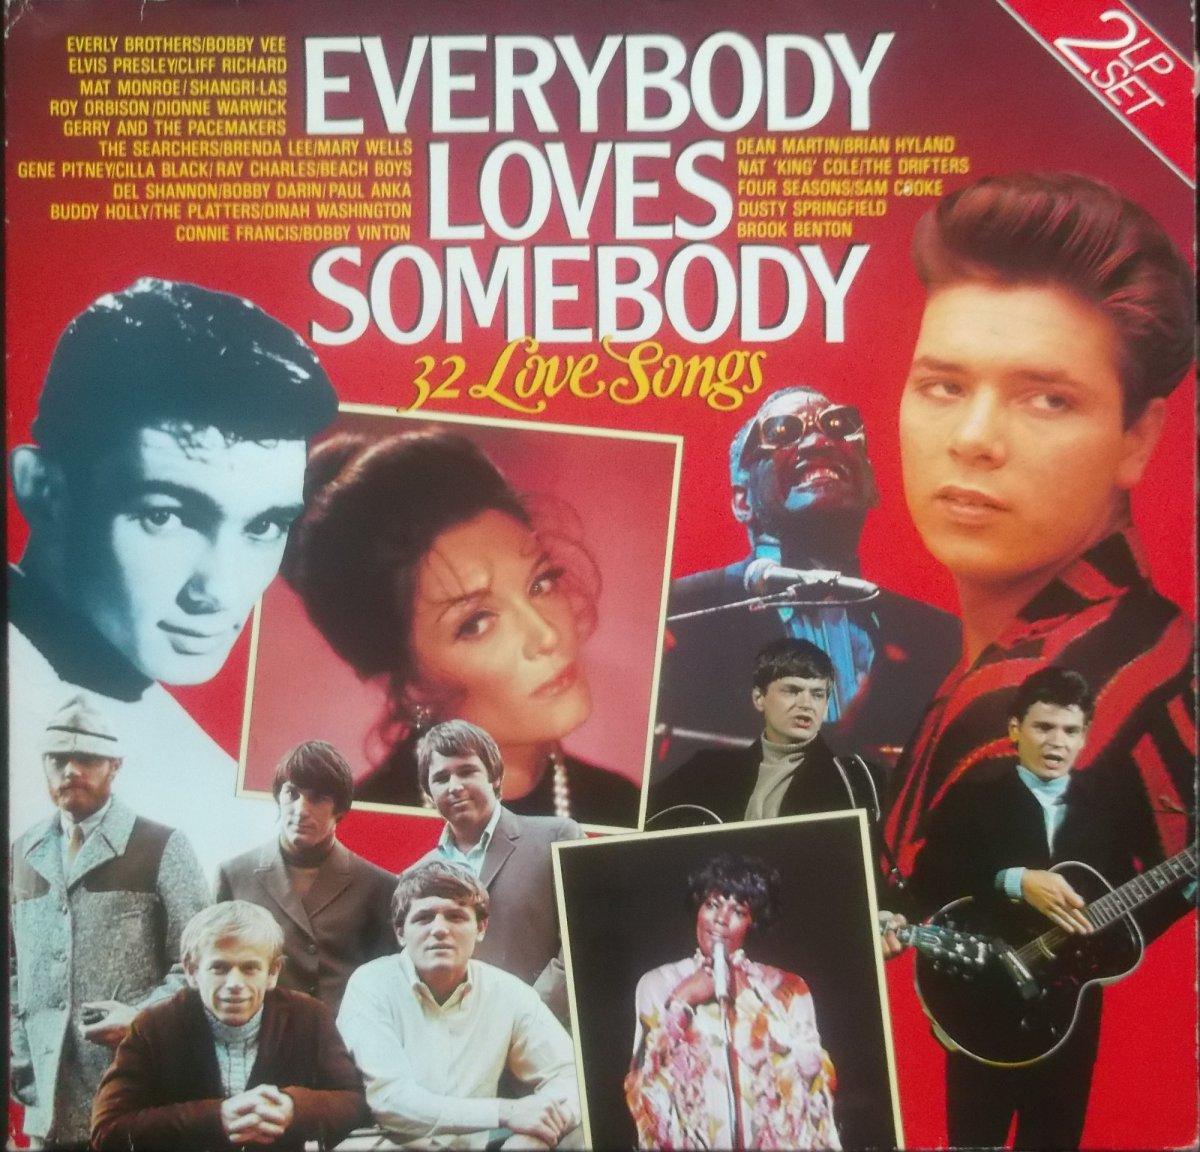 Various – Everybody Loves Somebody, 32 Love Songs 2xLP